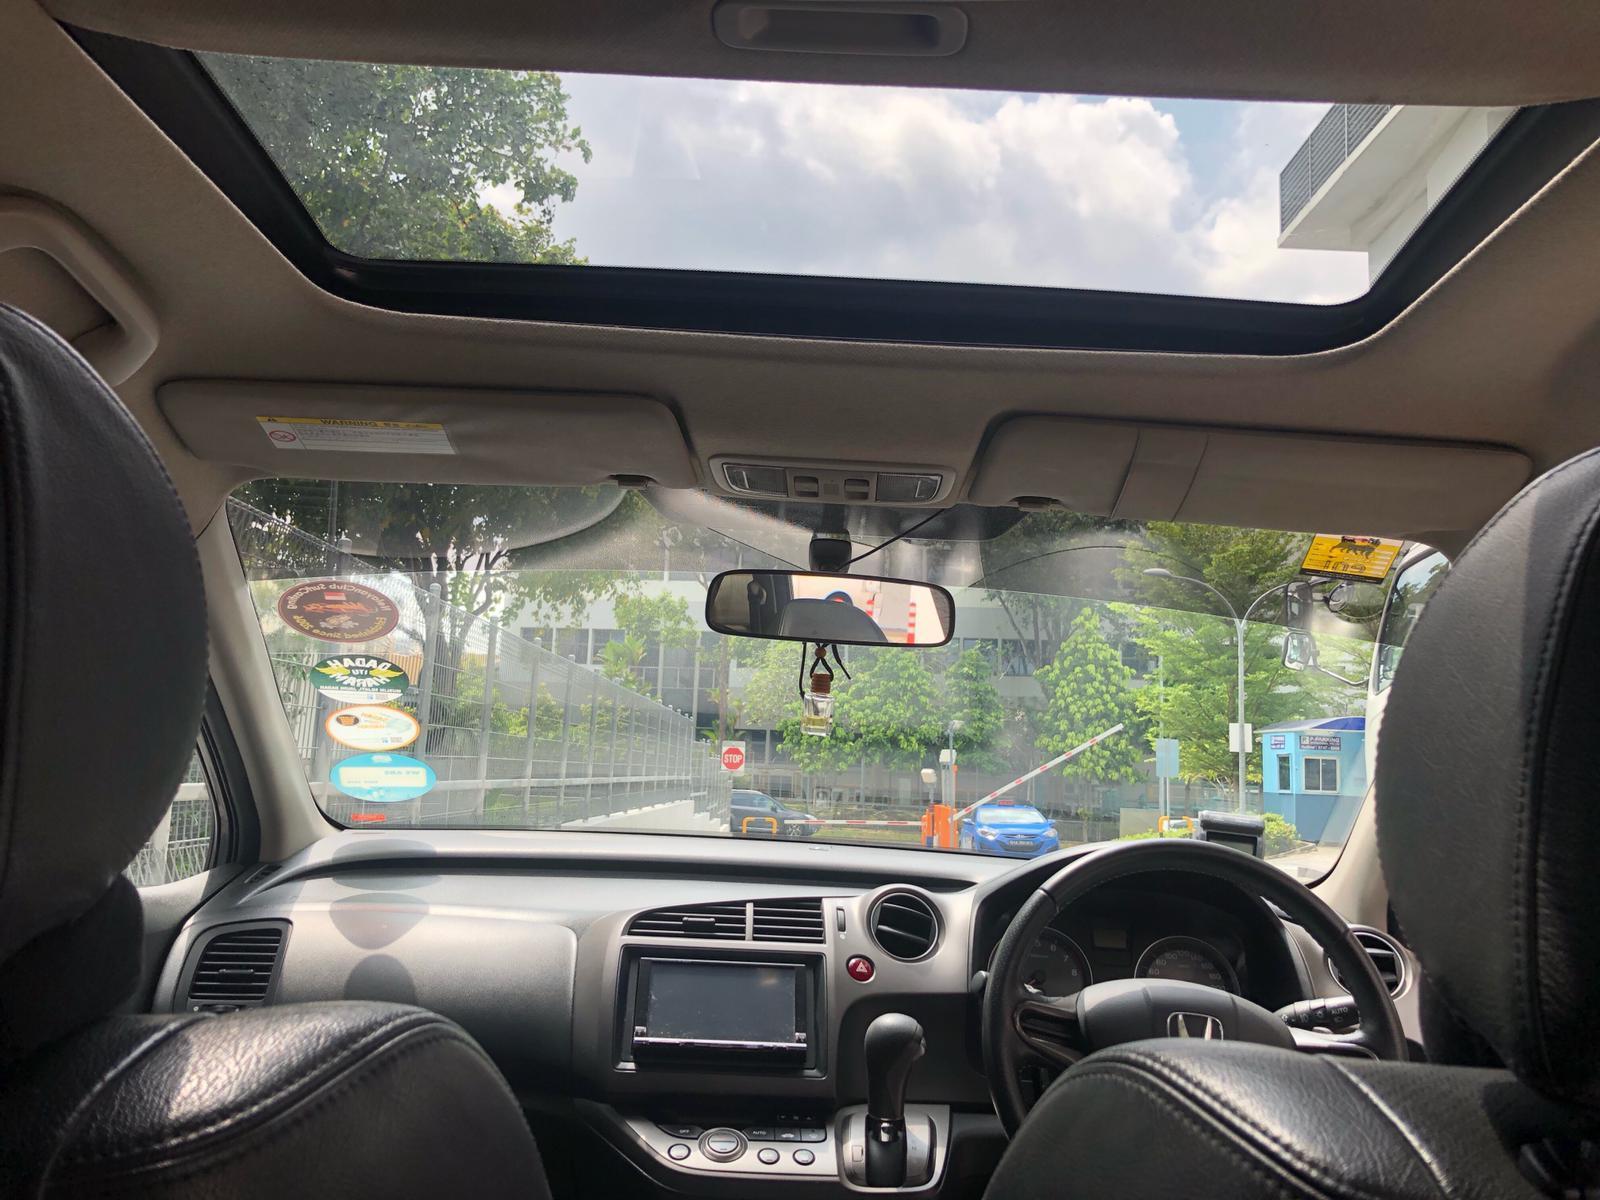 HONDA STREAM RSZ READY FOR GRAB GOJEK PHV/PERSONAL CAR RENTAL